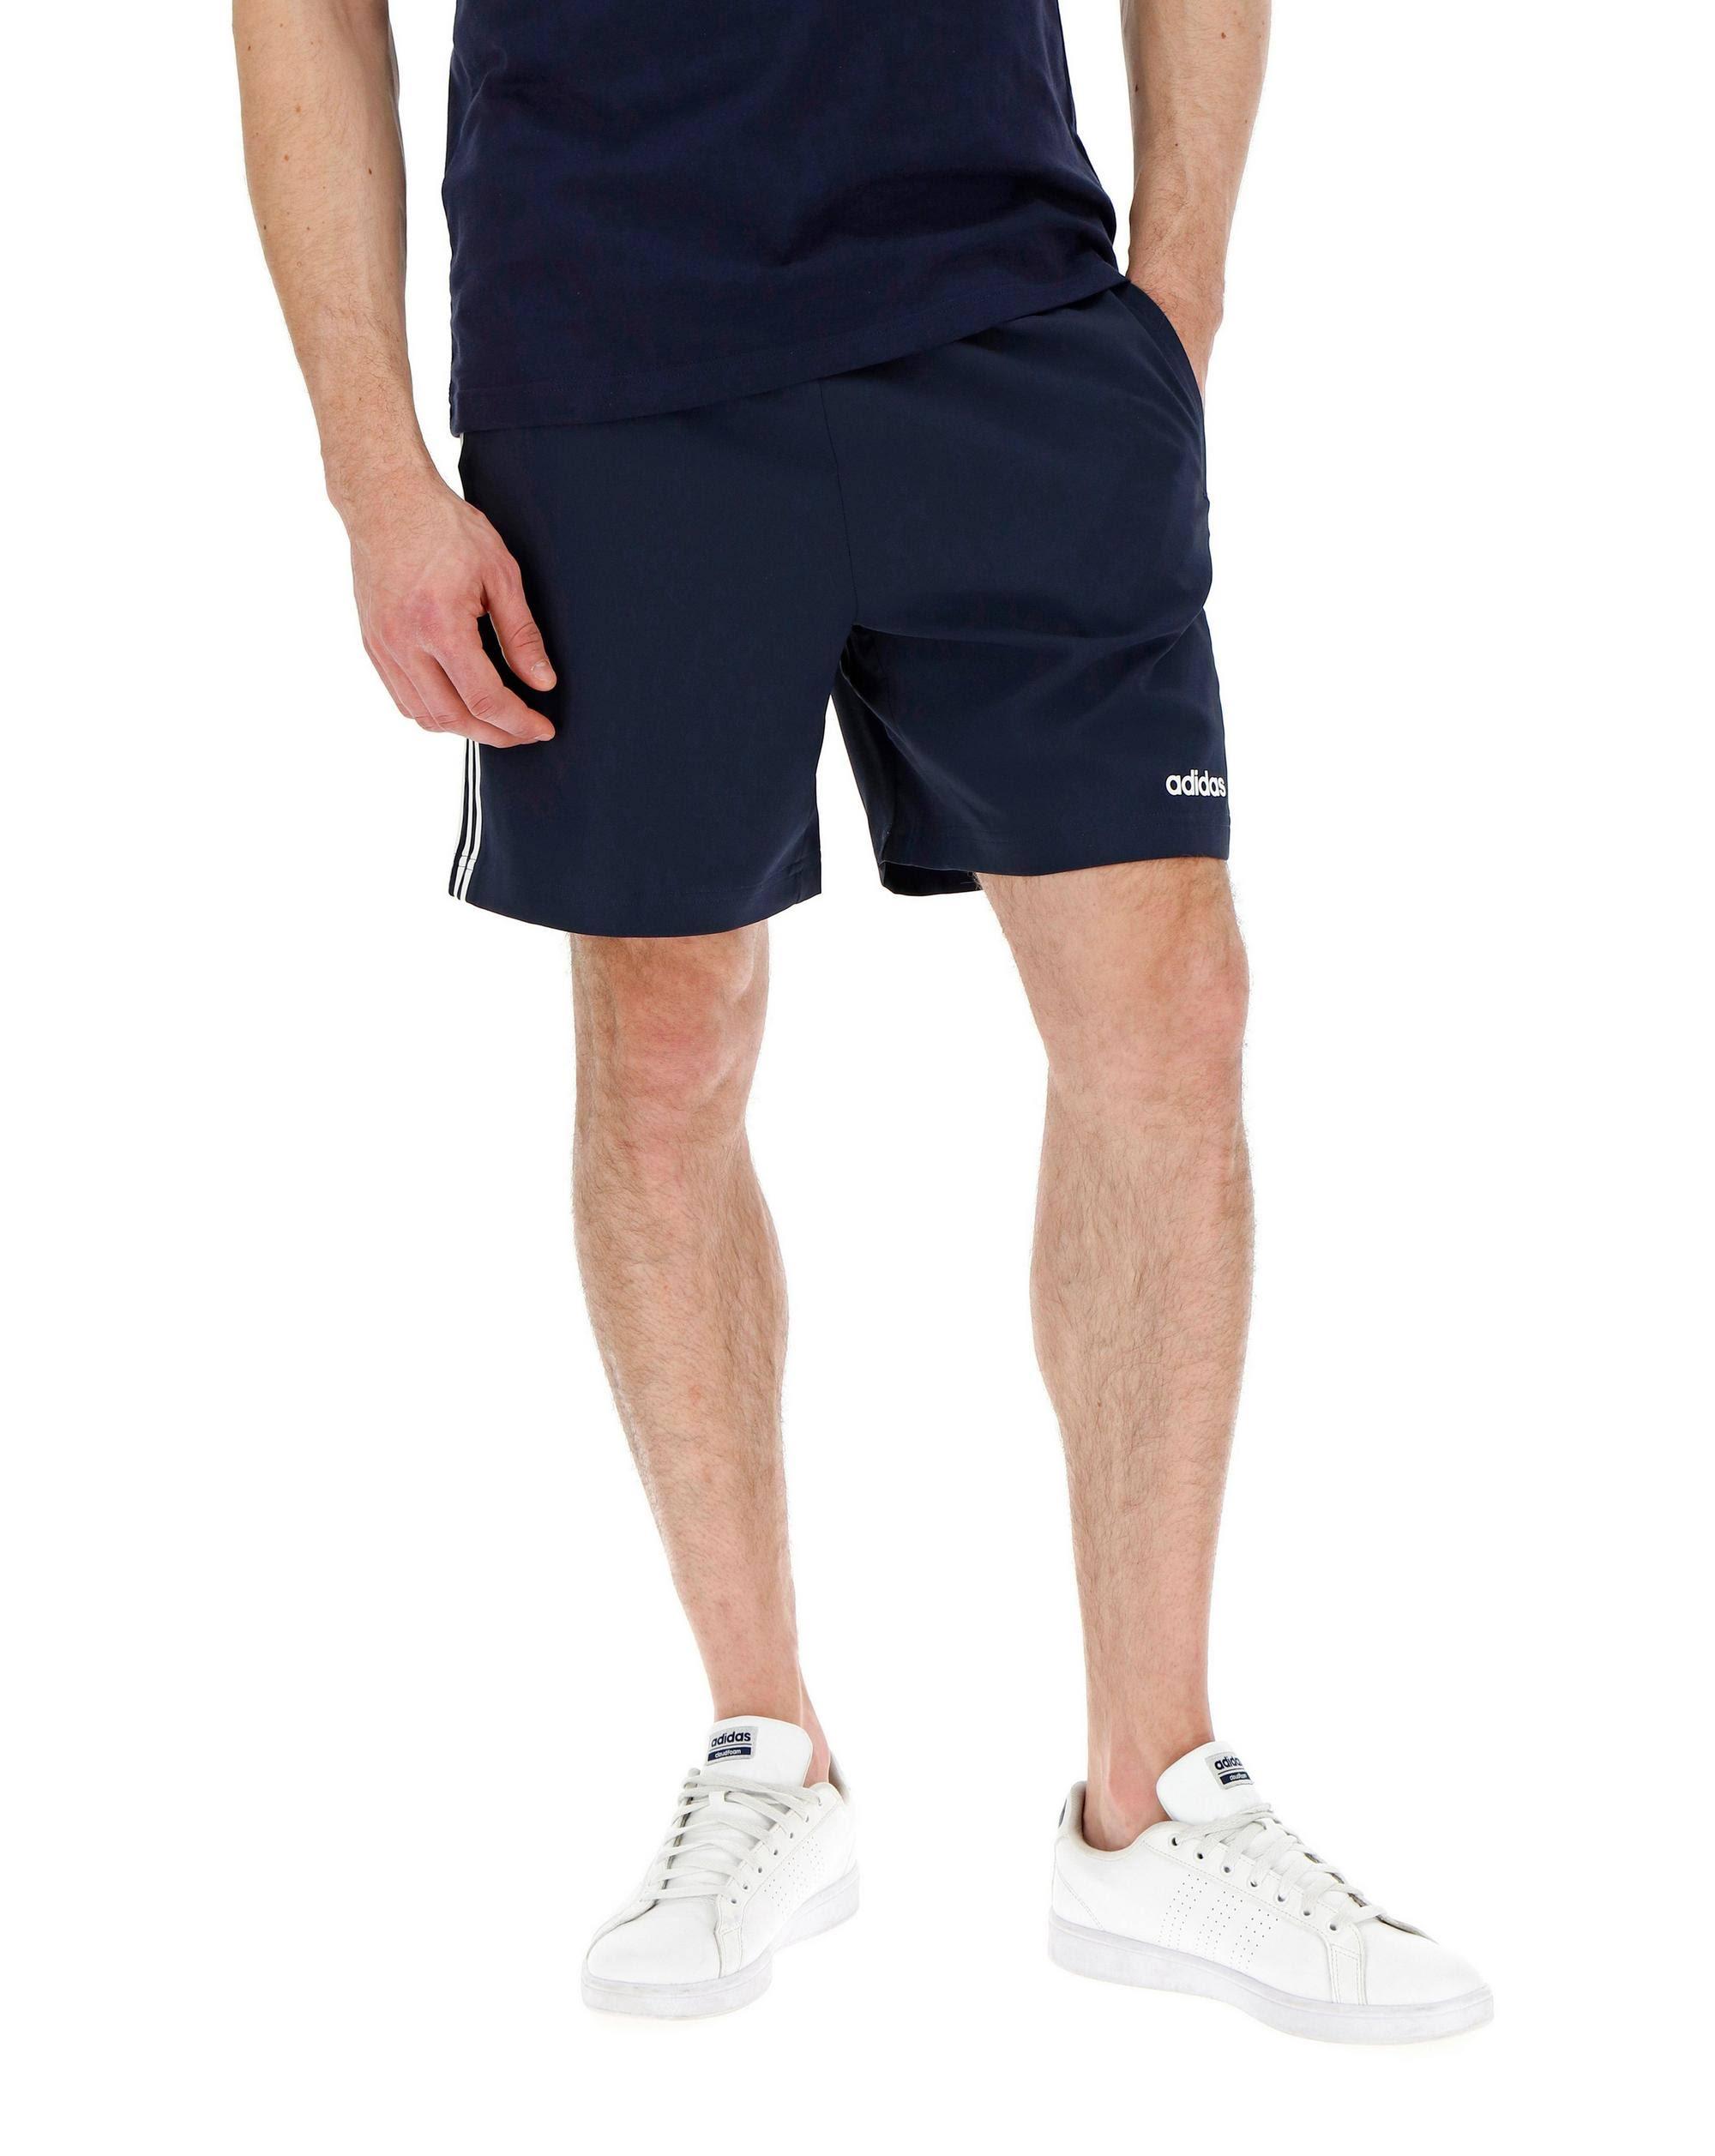 Adidas Essentials 3-Stripes Chelsea Shorts 7 Inch - Blue - Men